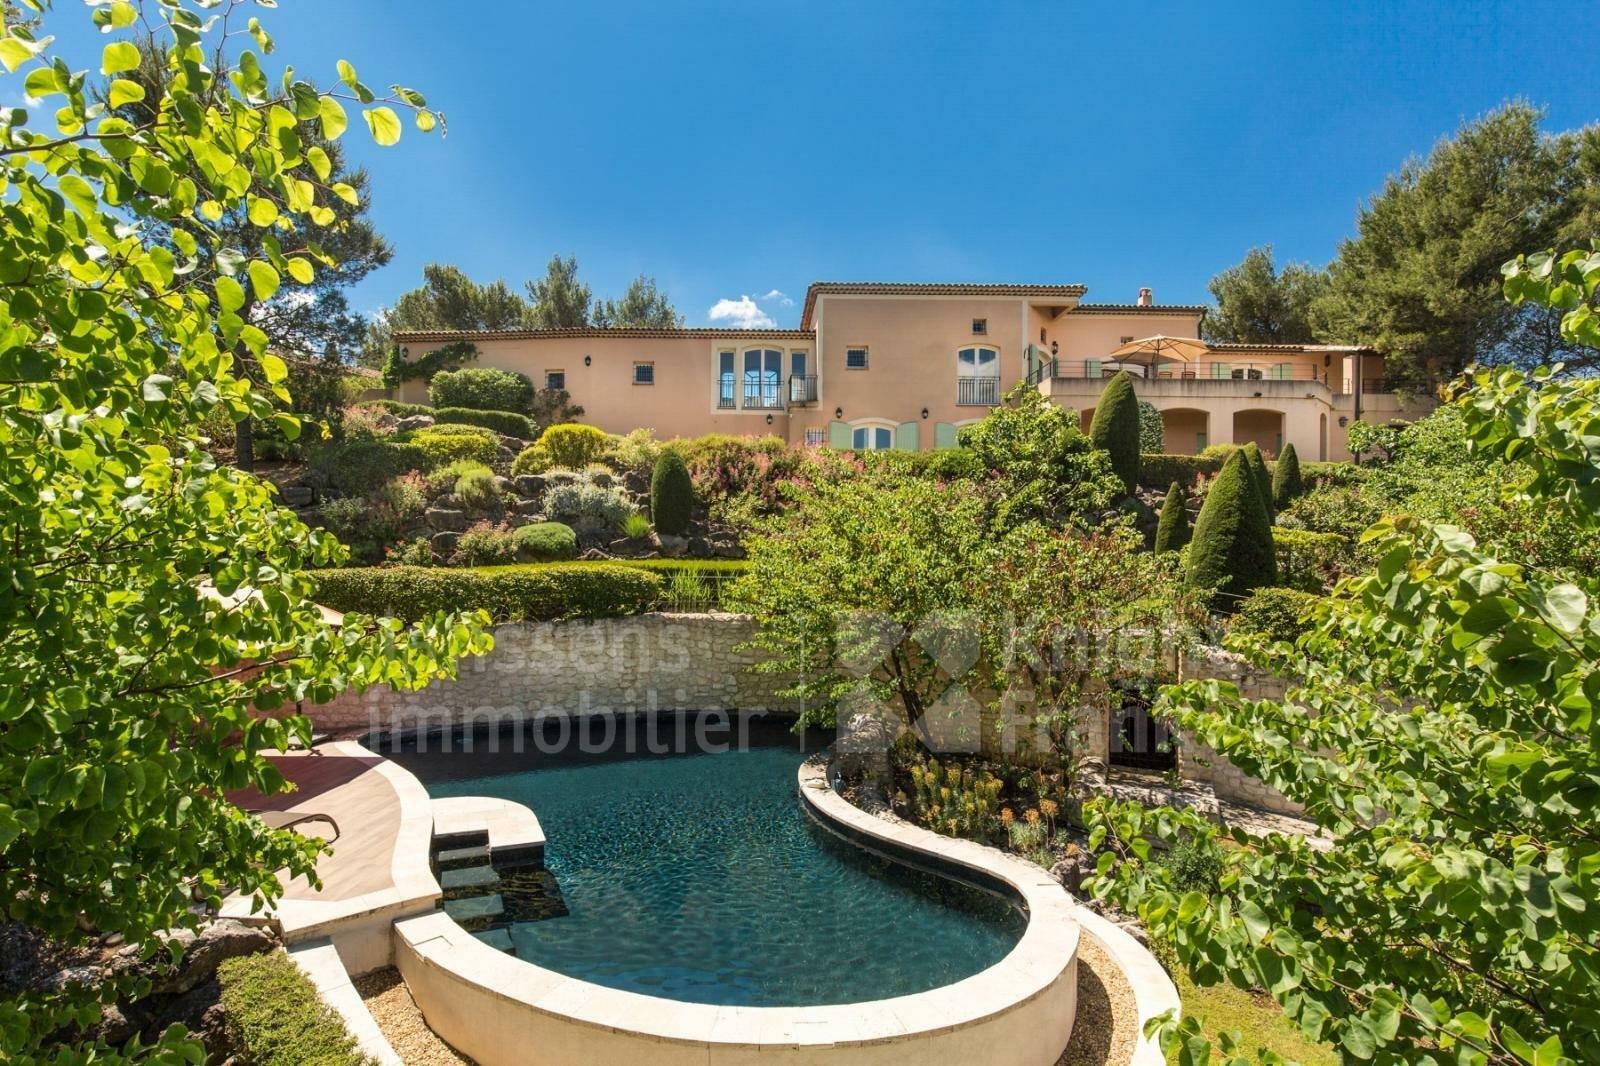 Villa in Mallemort, Provence-Alpes-Côte d'Azur, France 1 - 11486084